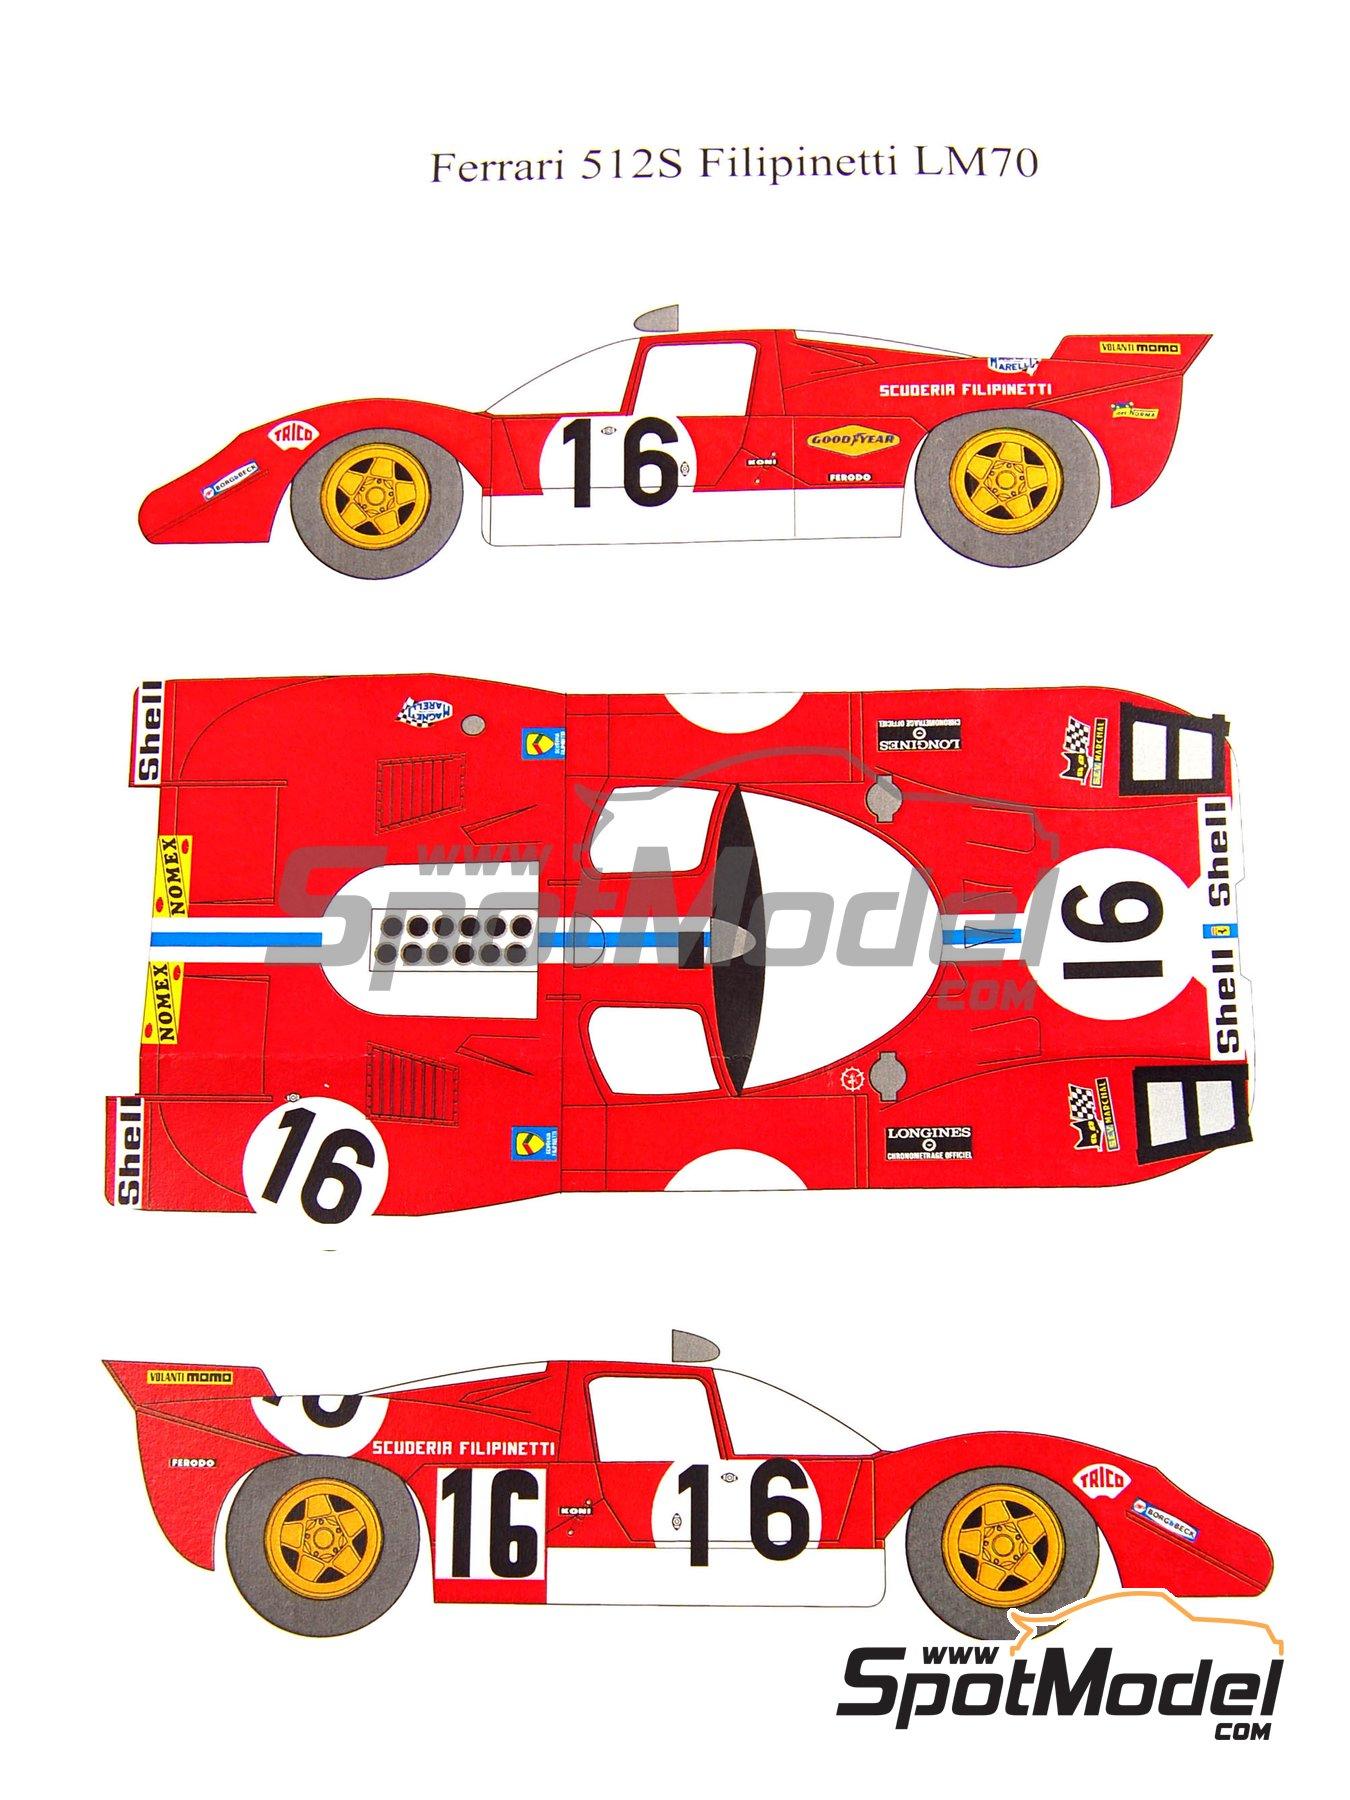 Ferrari 512S Scuderia Filipinetti - 24 Horas de Le Mans 1970 | Decoración en escala1/24 fabricado por Renaissance Models (ref.TK24-321D) image